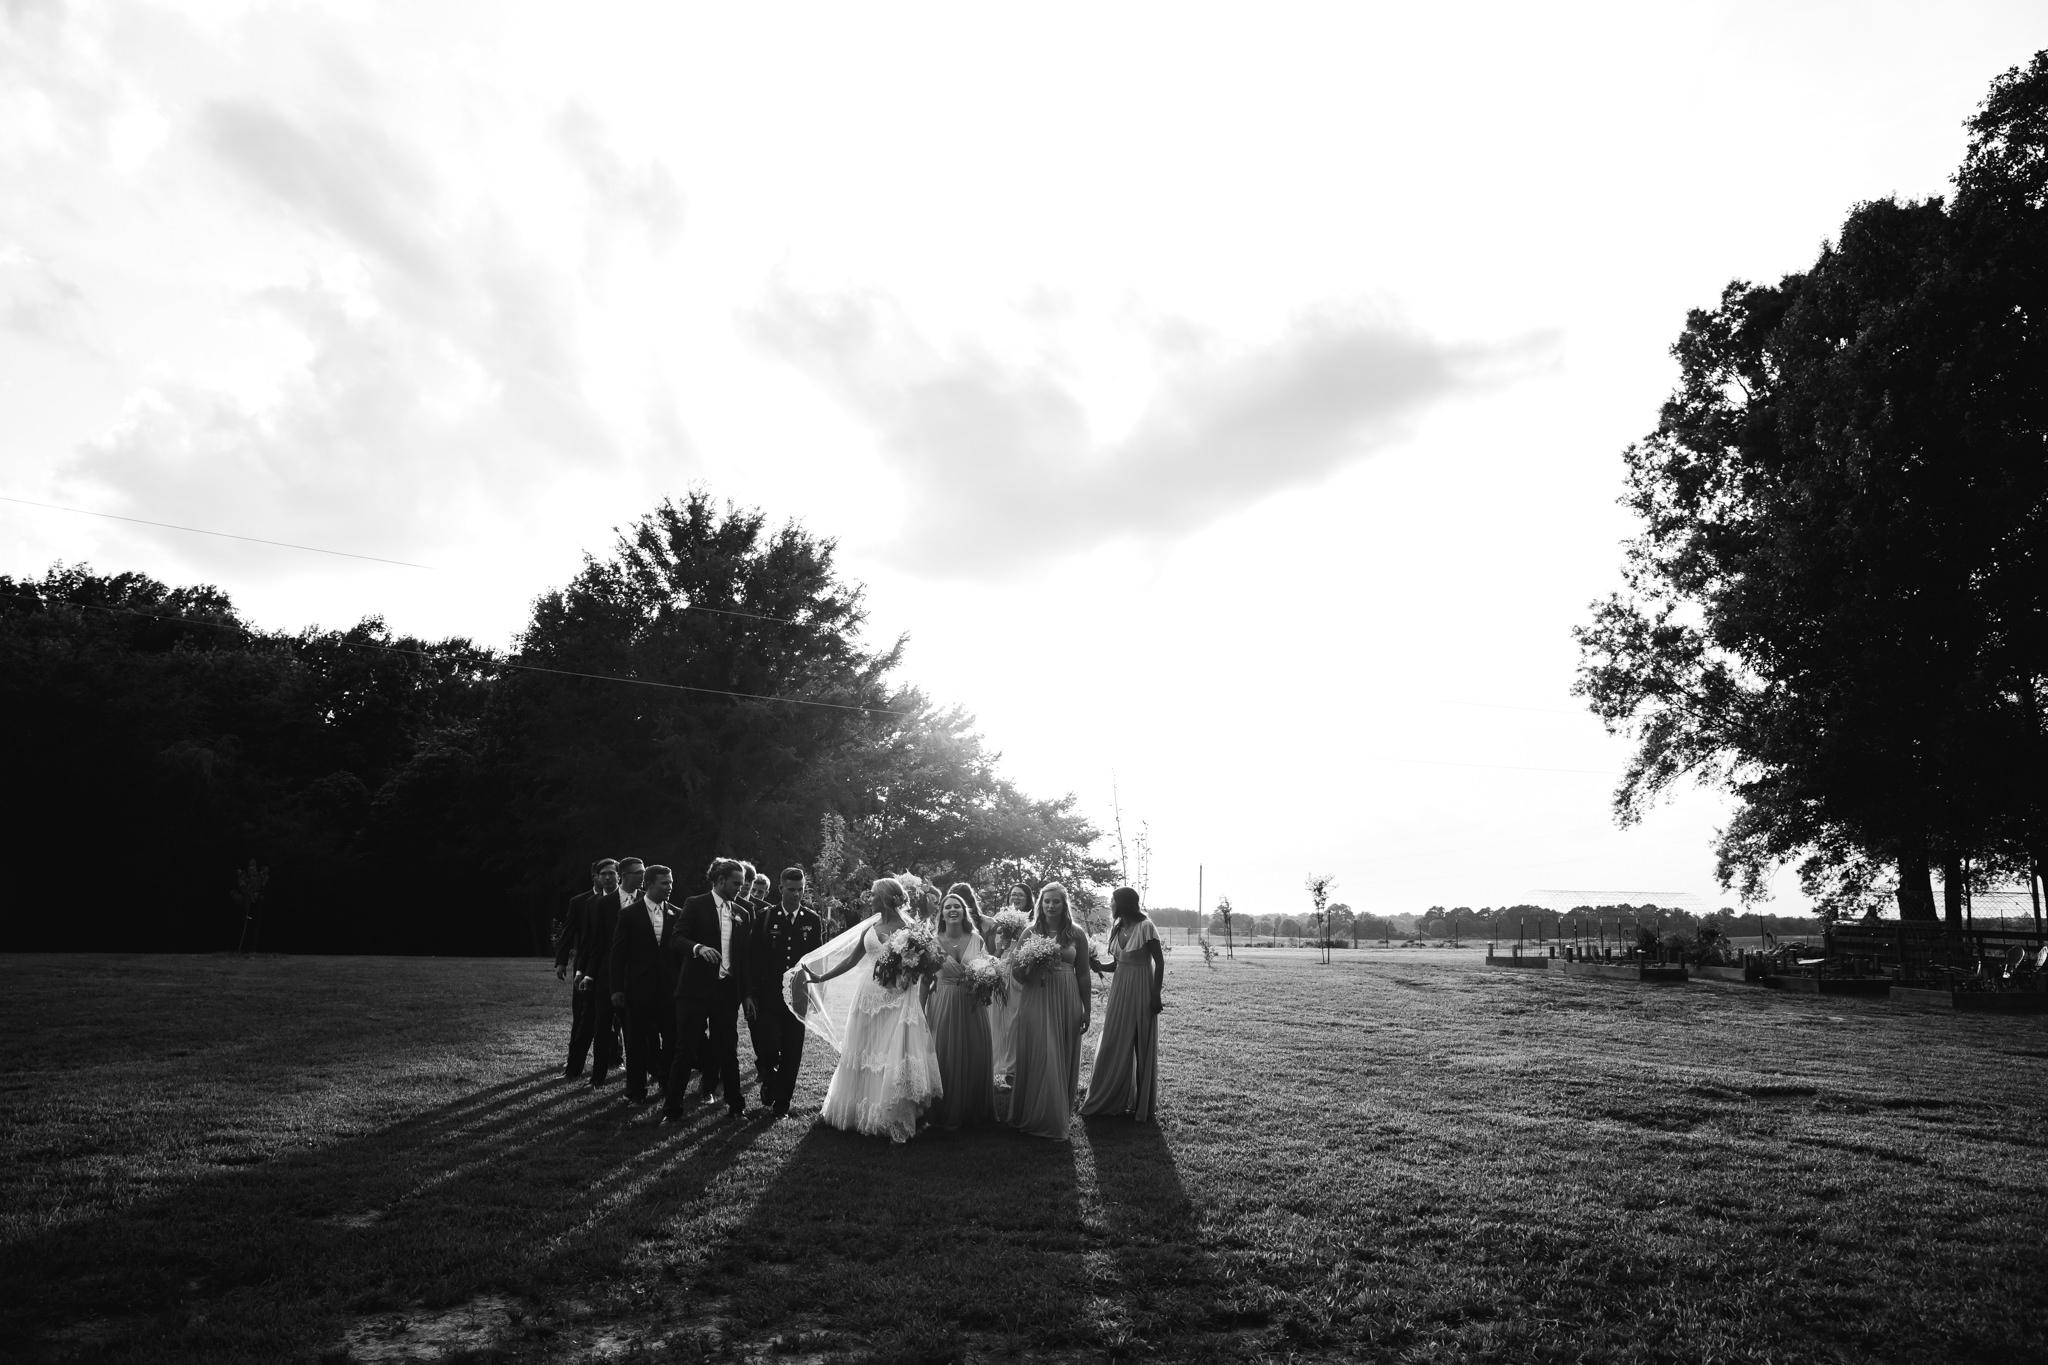 backyard-wedding-thewarmtharoundyou-lexy-branson-3-2.jpg